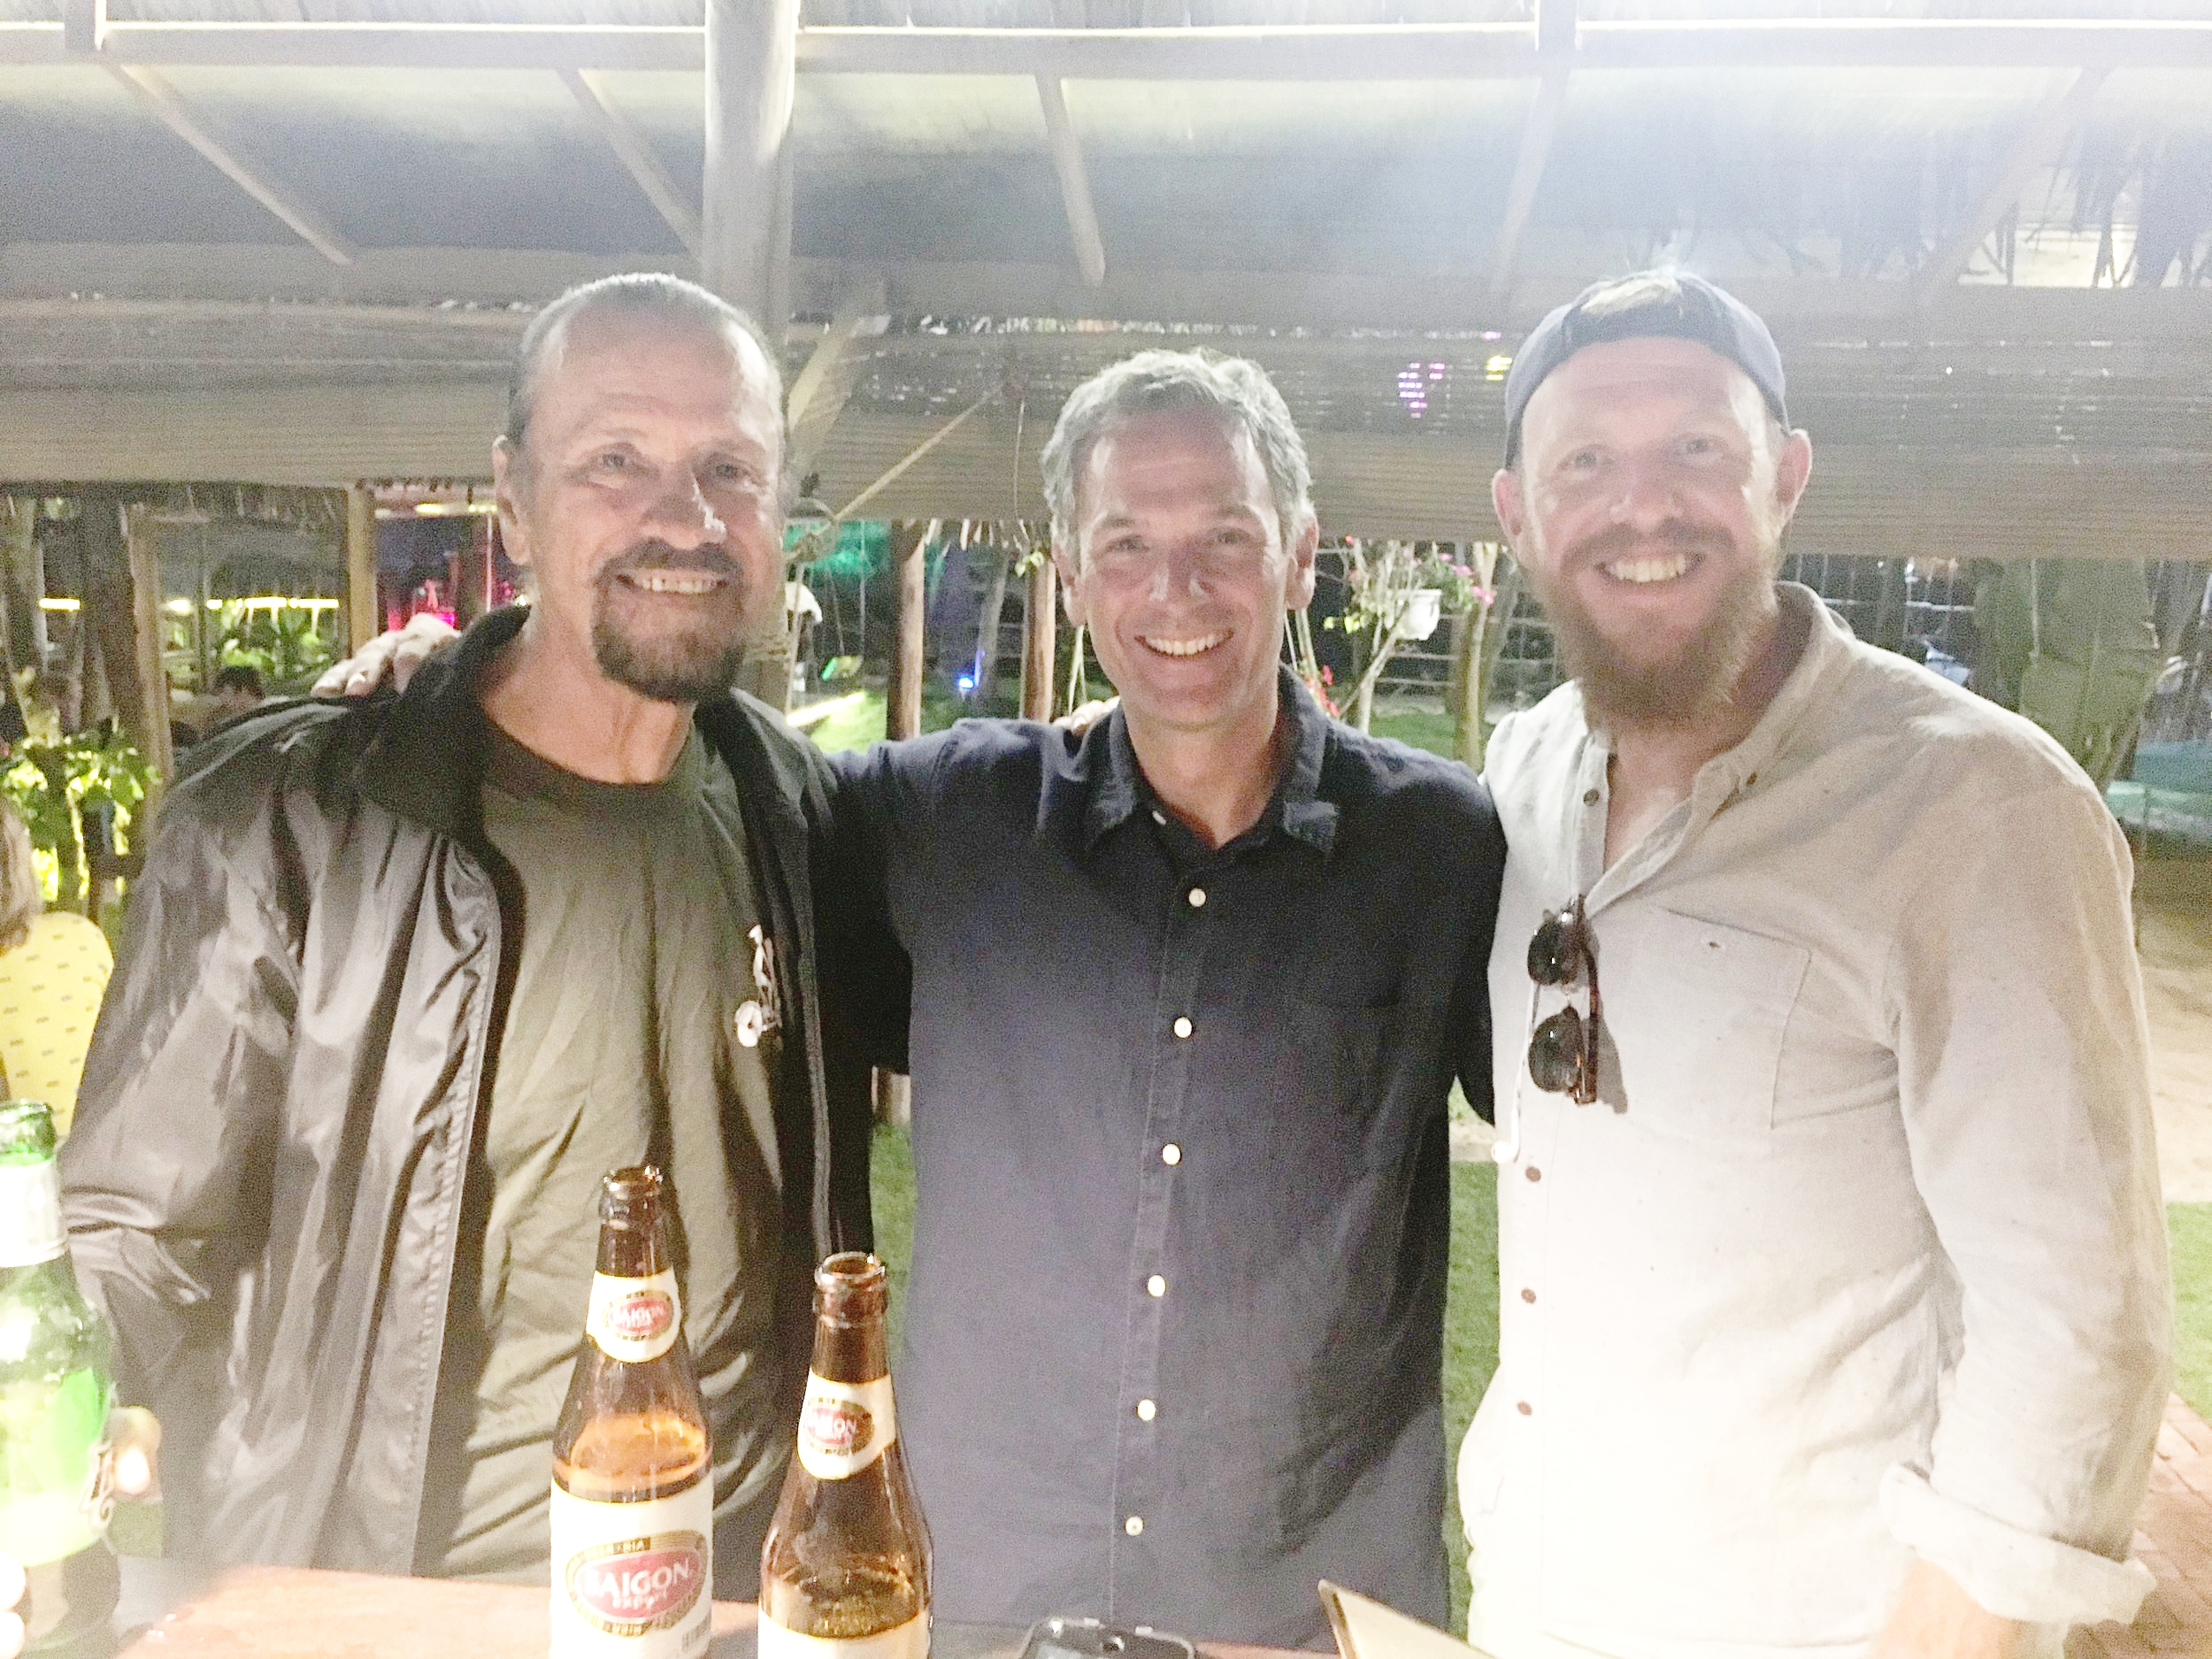 Friends - Joh, Colin & I